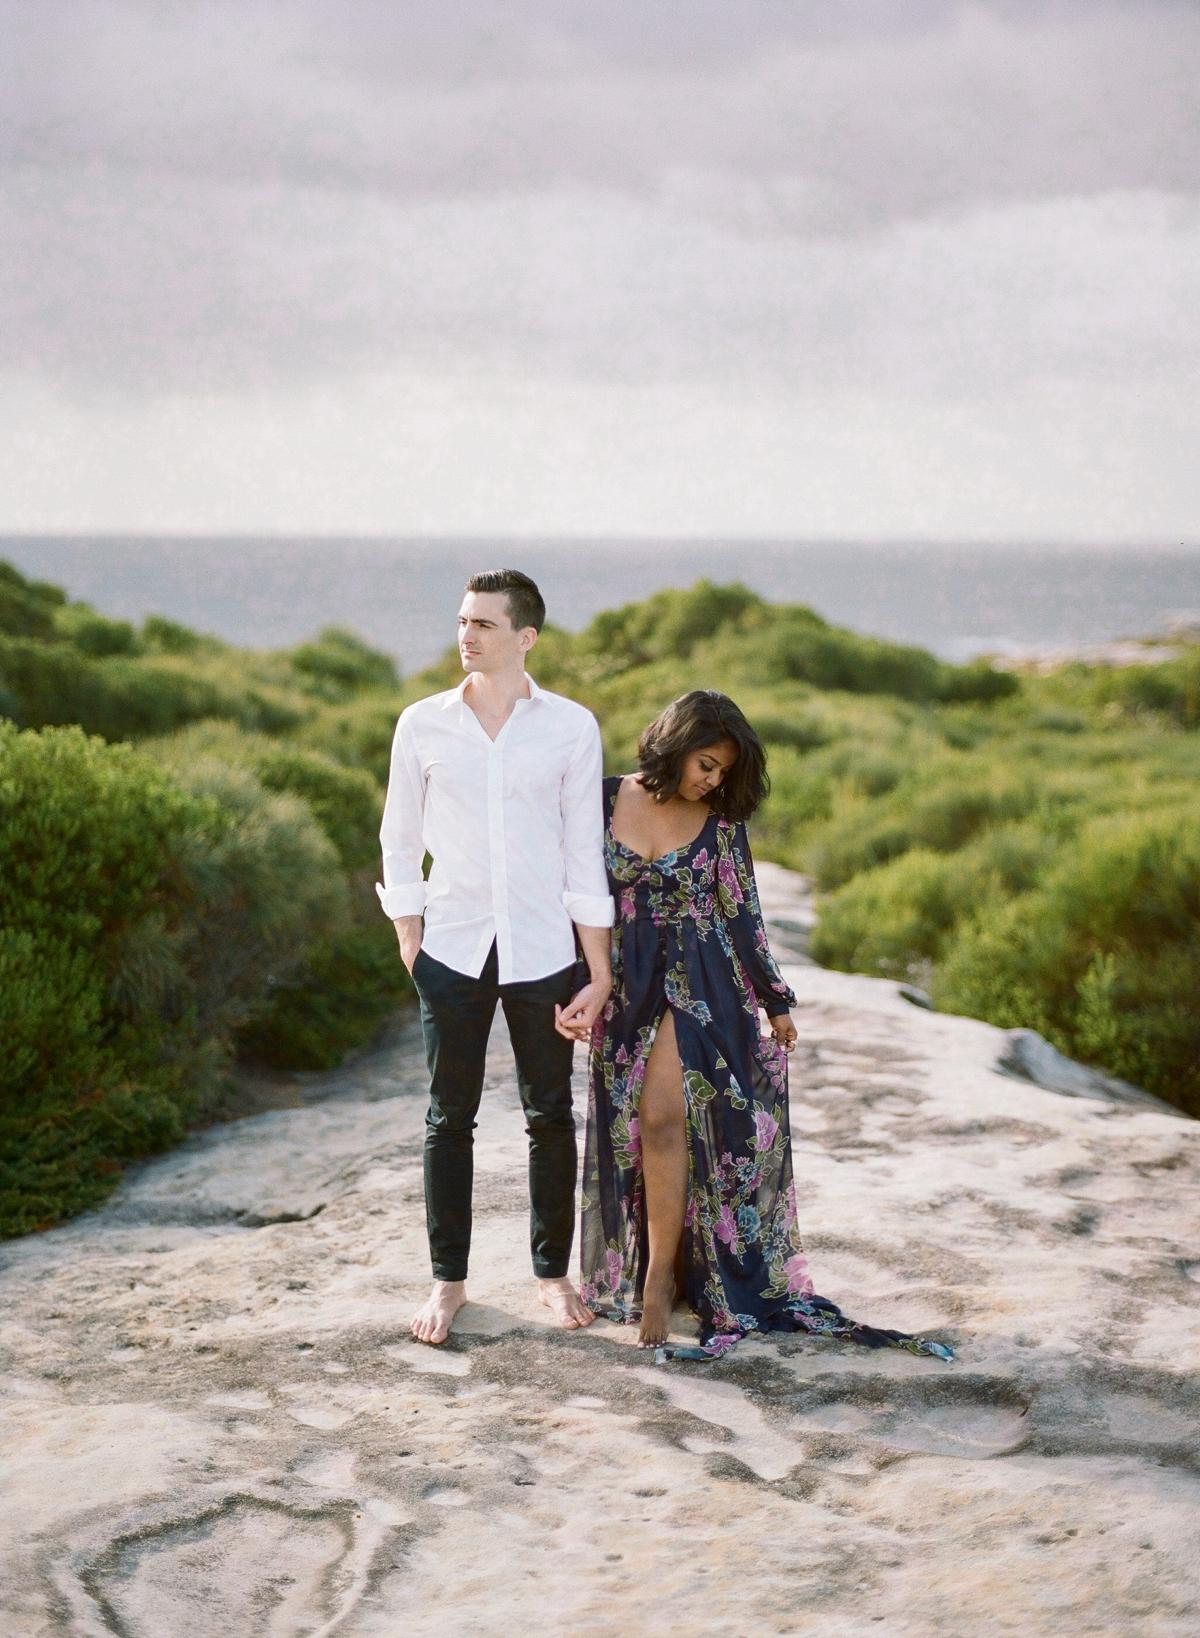 Coastal Sydney couples session by Mr Edwards Photography_0737_1110.jpg